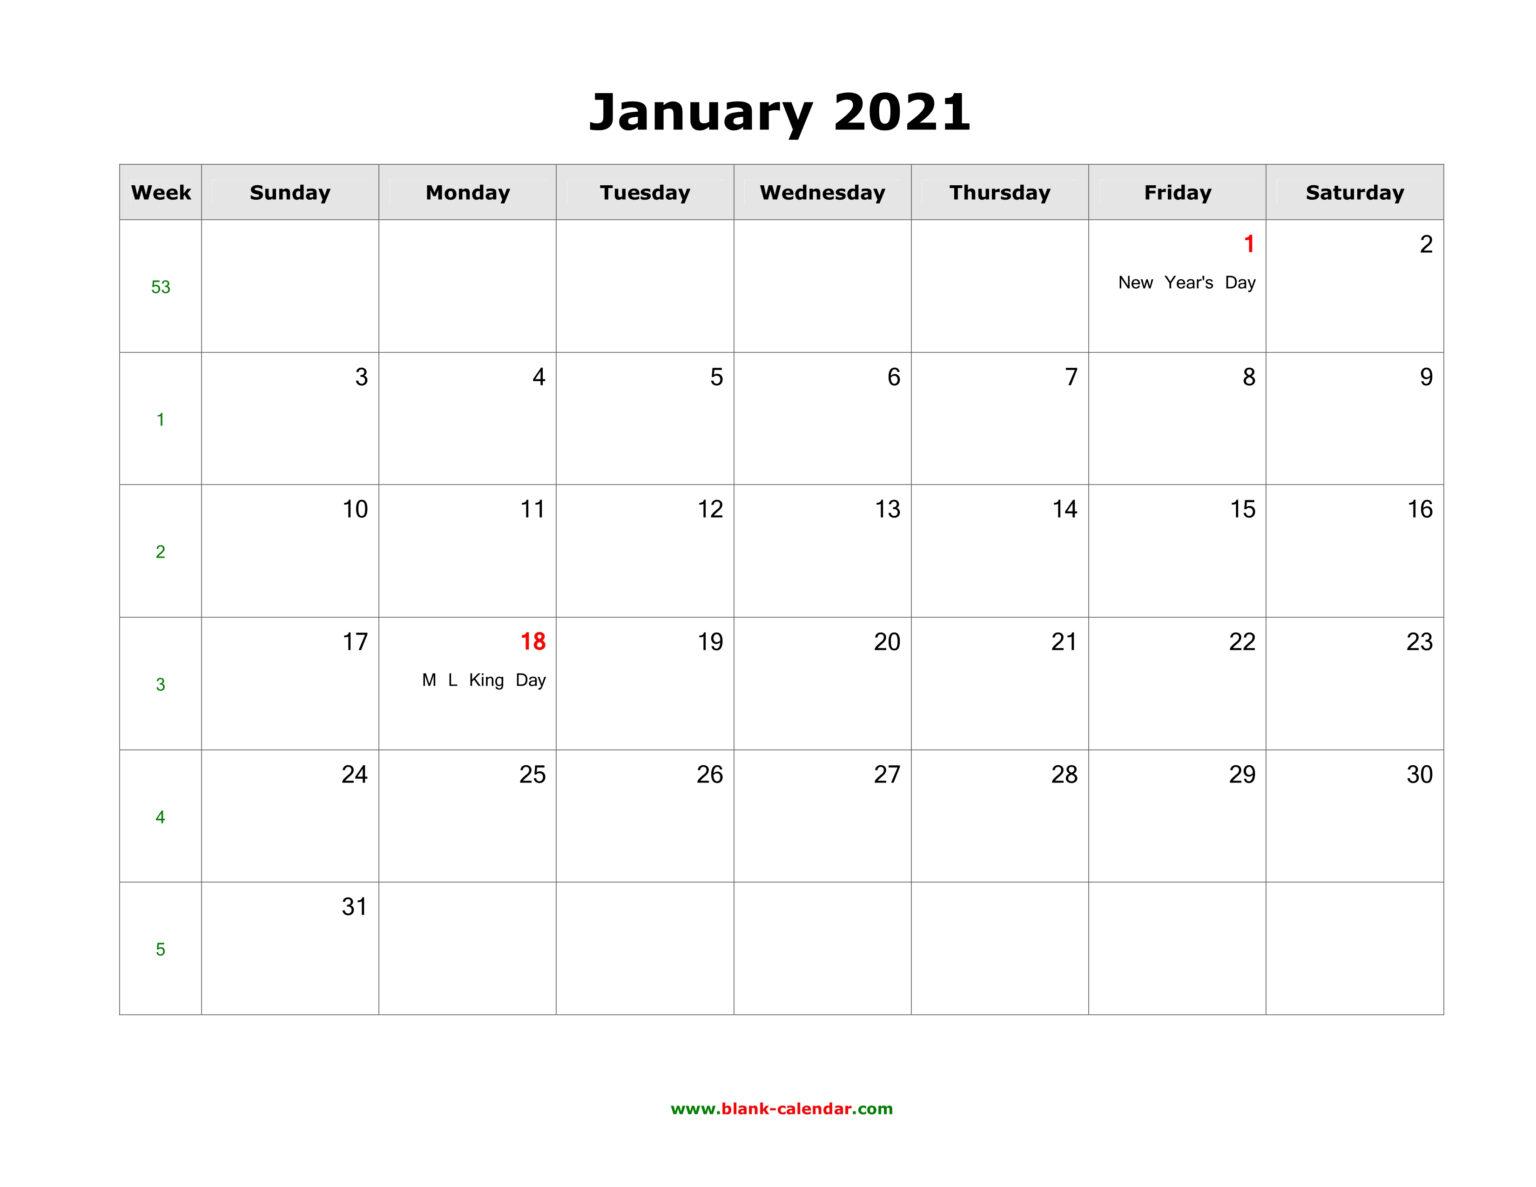 January 2021 Blank Calendar | Free Download Calendar